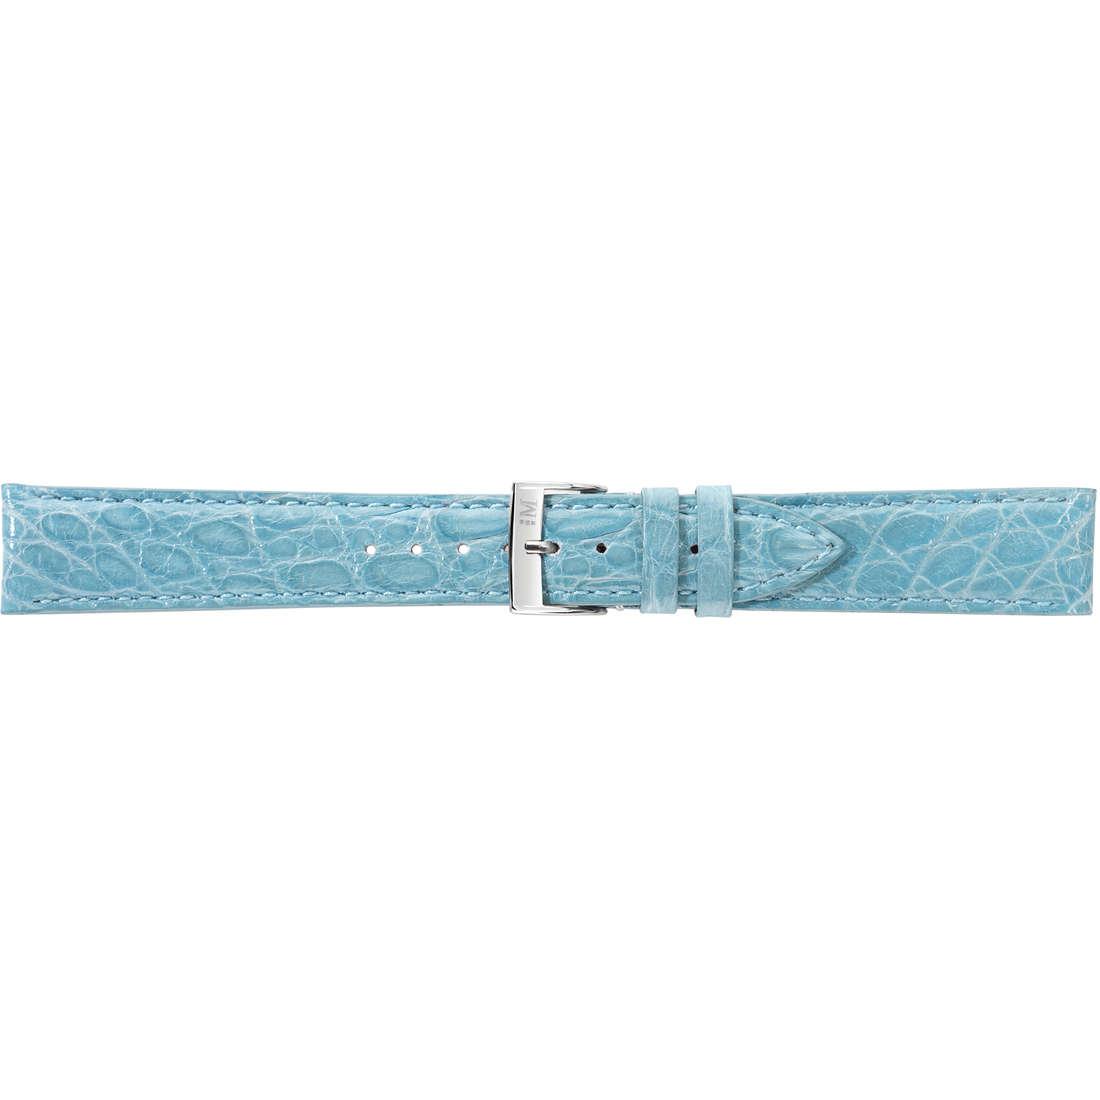 watch watch bands watch straps man Morellato Pelli Preziose A01X2197052168CR18